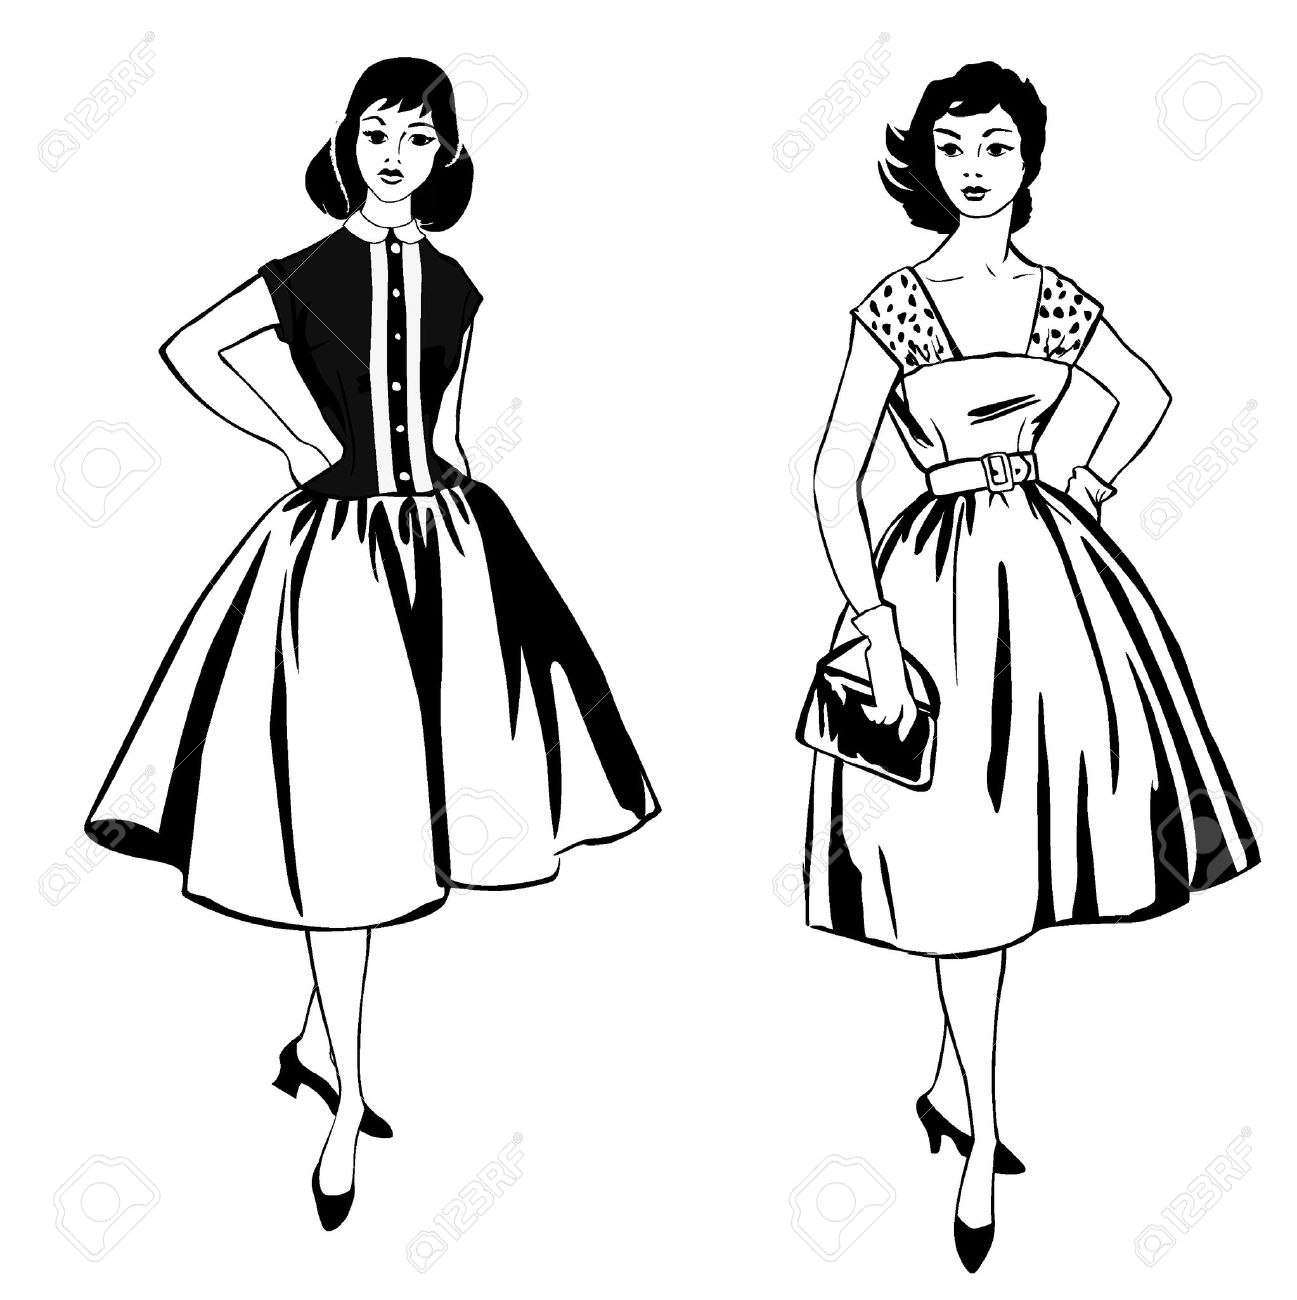 Ben noto Moda Elegante Vestito Ragazze 1950 S 1960 S Stile Retrò Moda  BG79